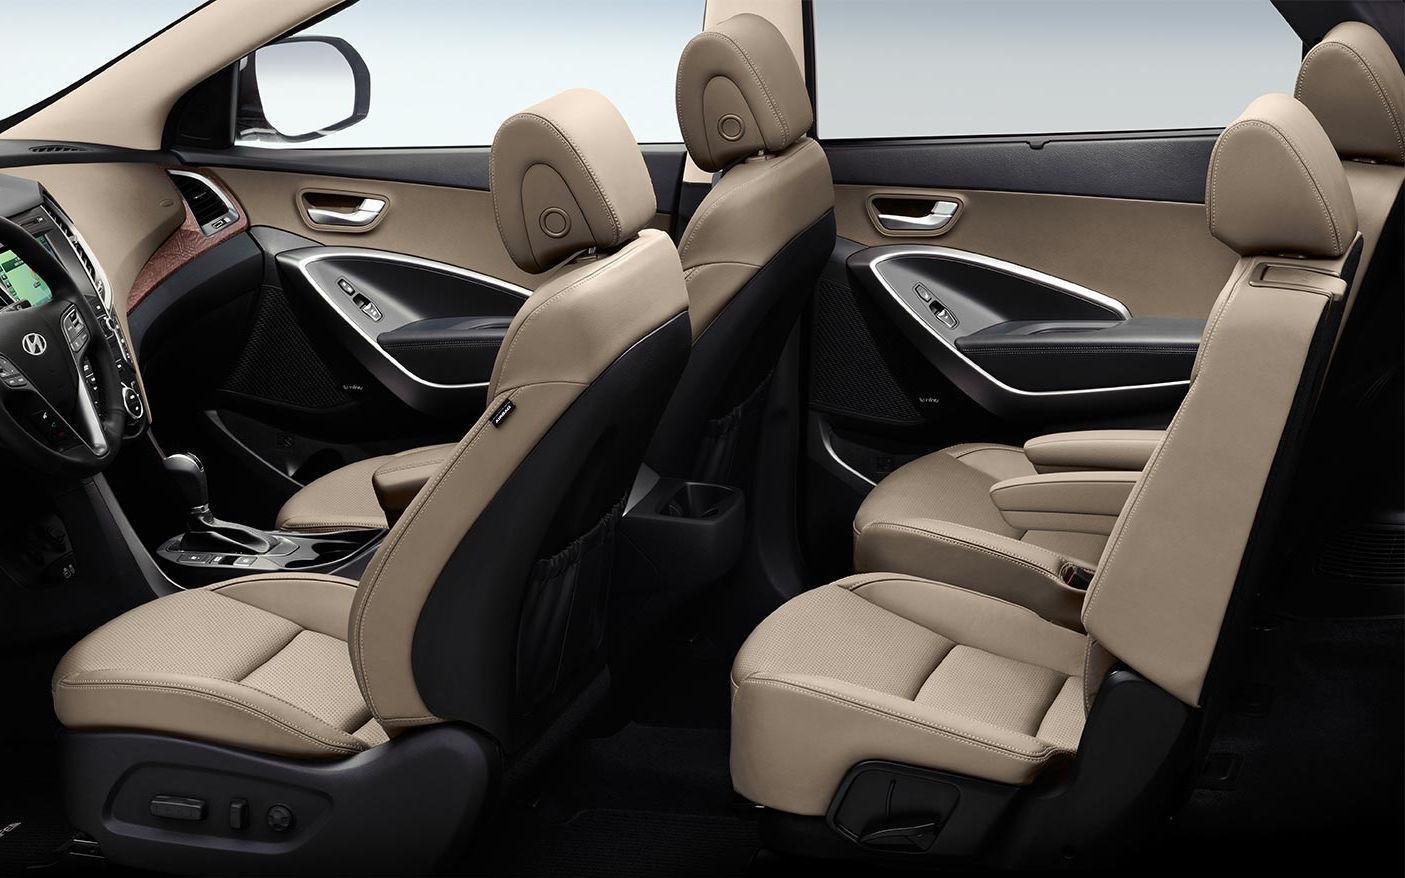 2017 Hyundai Santa Fe Limited Interior | www.indiepedia.org